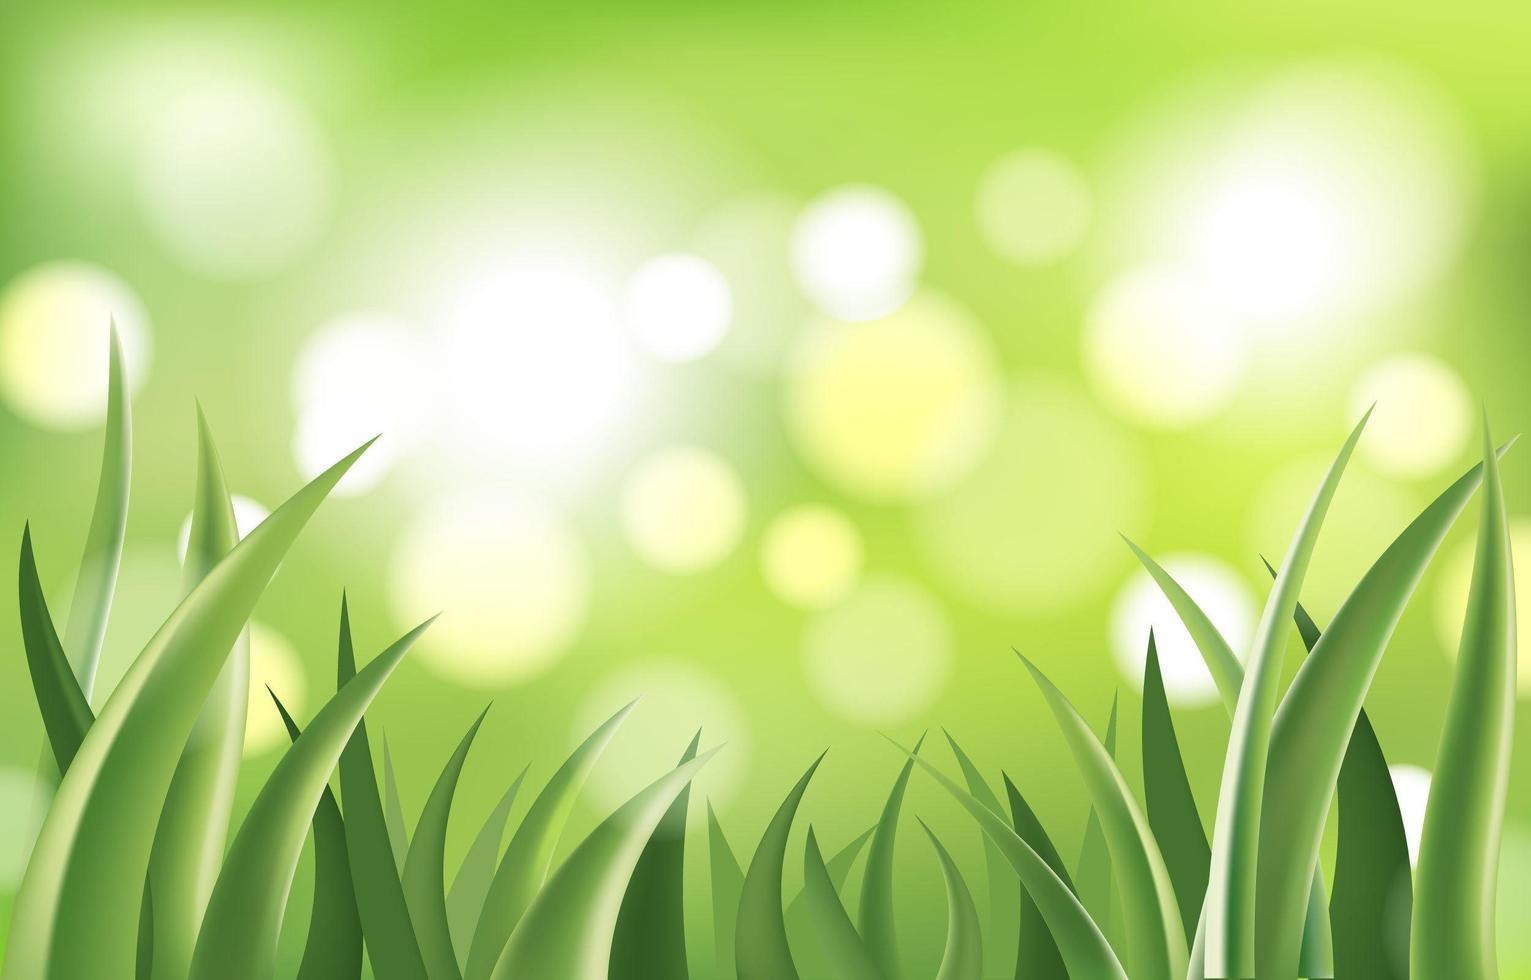 herbe verte abstraite en arrière-plan bokeh vecteur